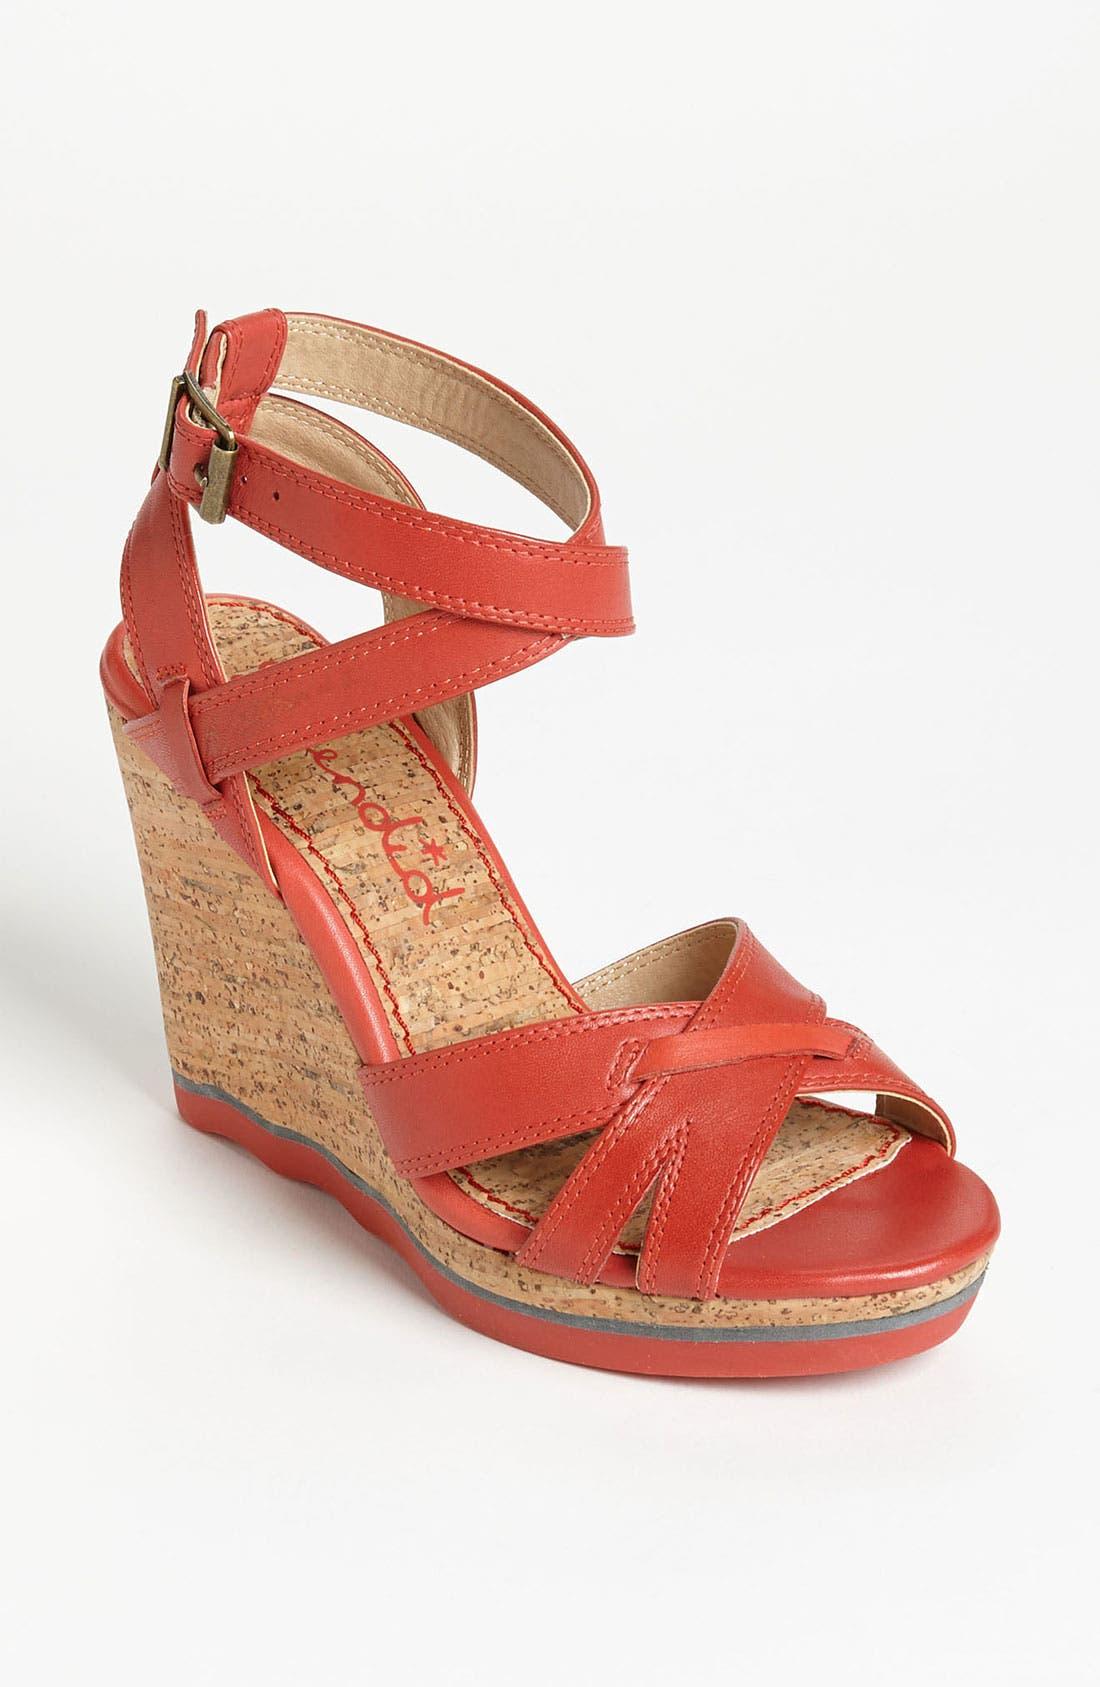 Alternate Image 1 Selected - Splendid 'Sage' Sandal